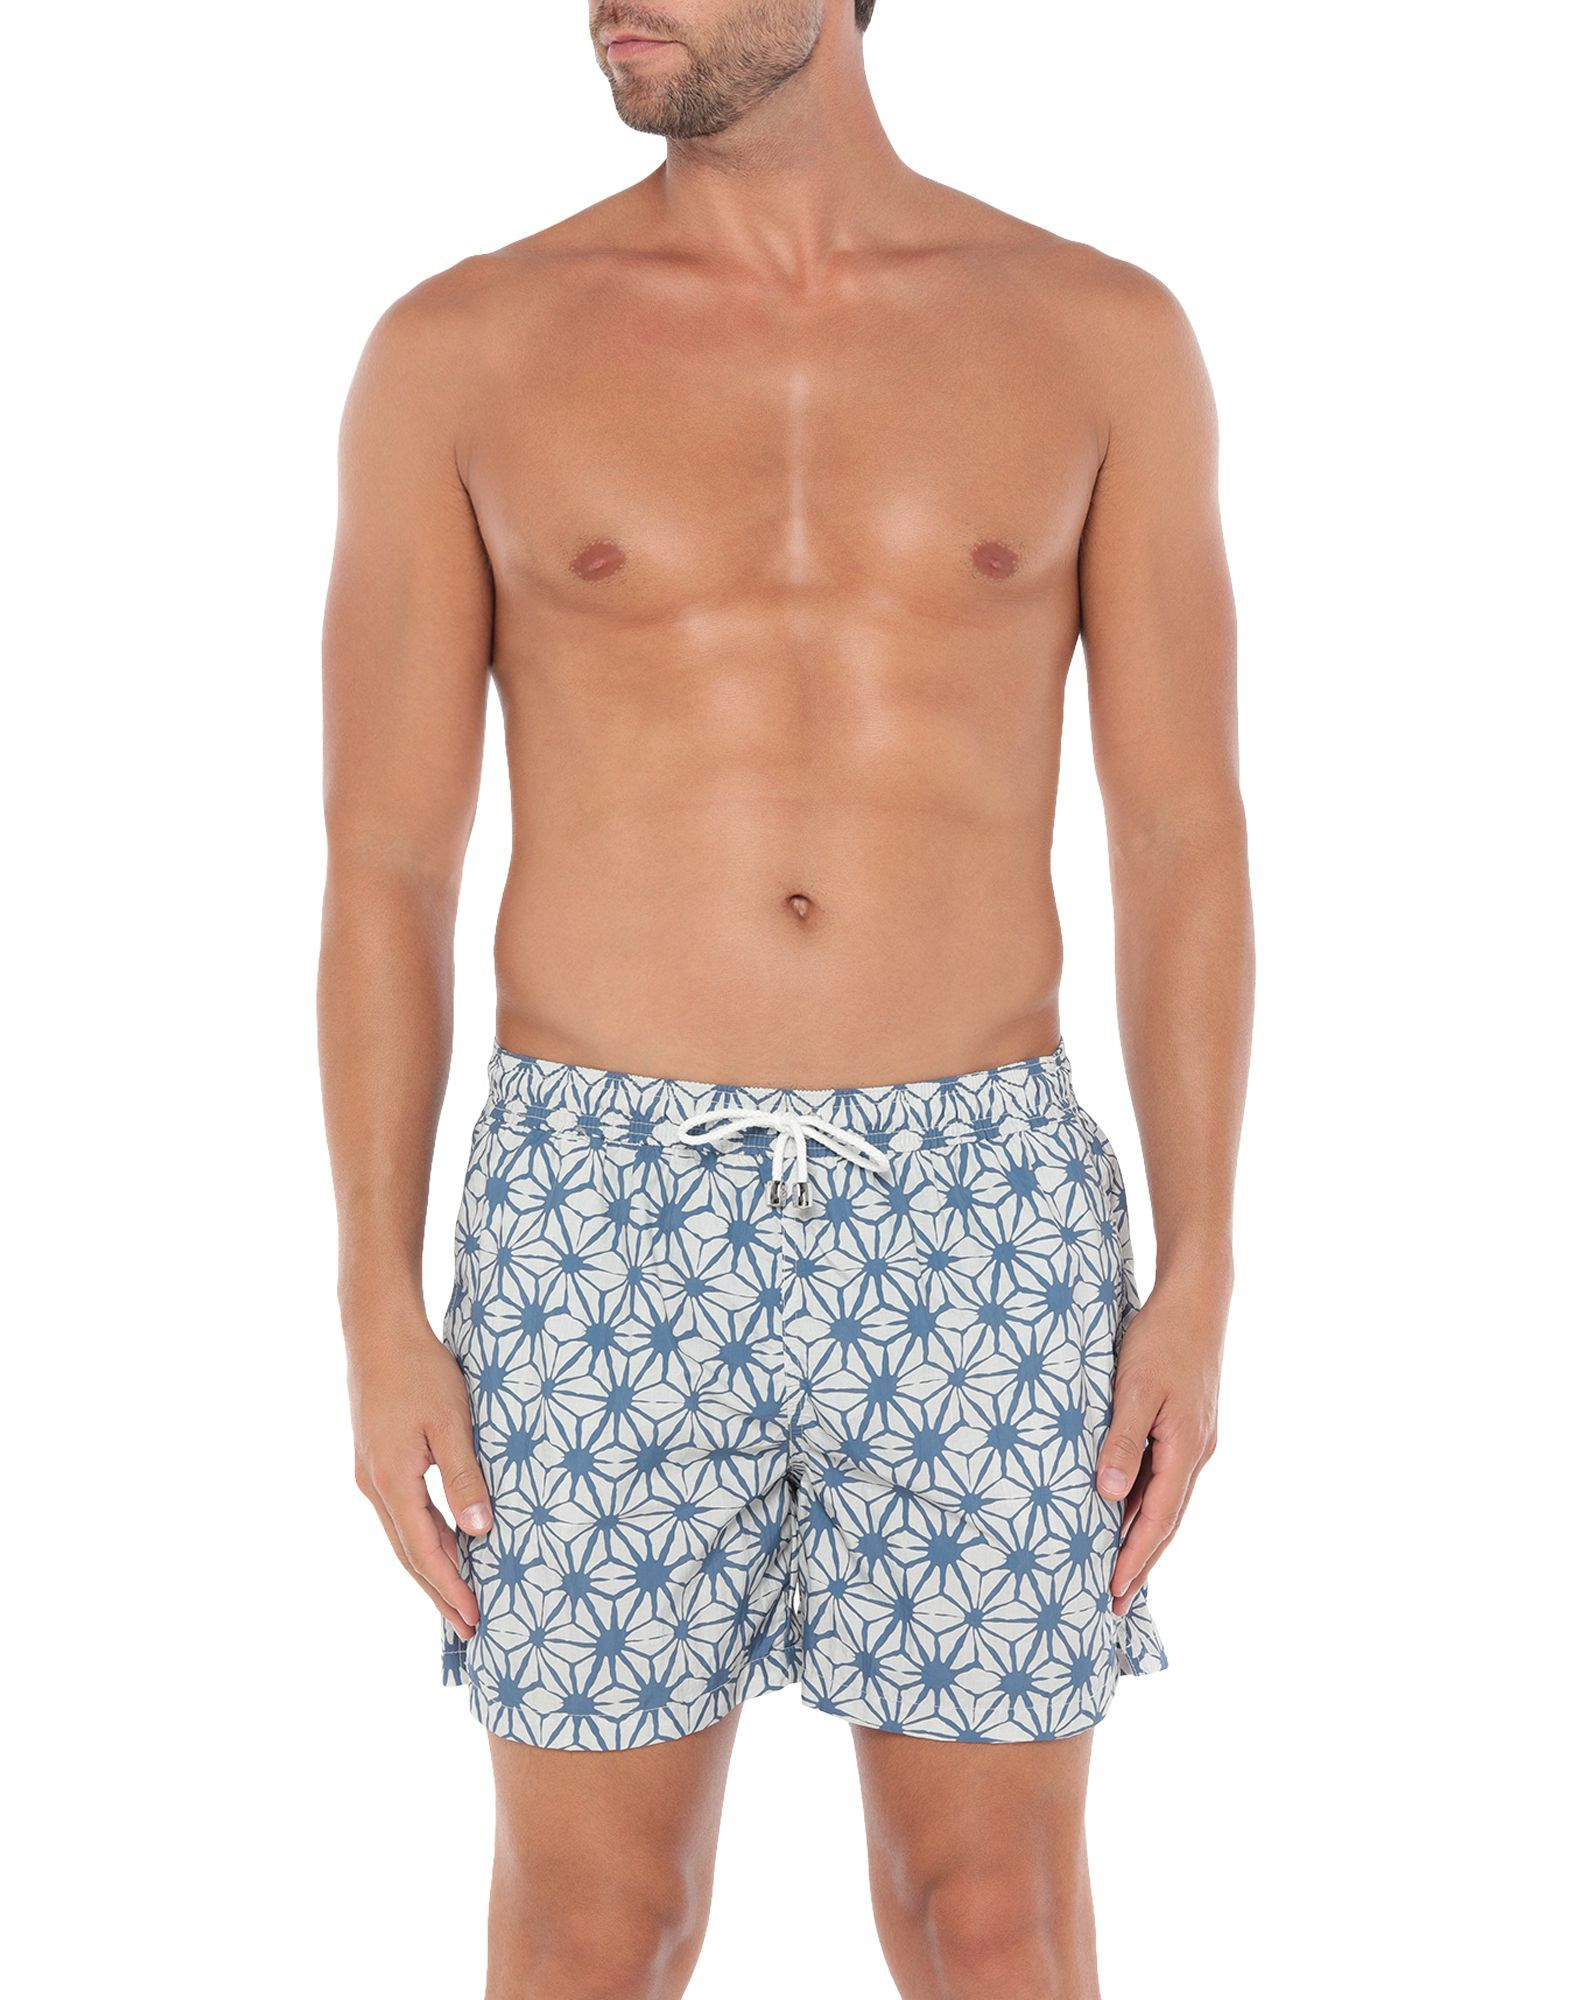 Luigi Borrelli Napoli Man Swimming trunks Polyamid